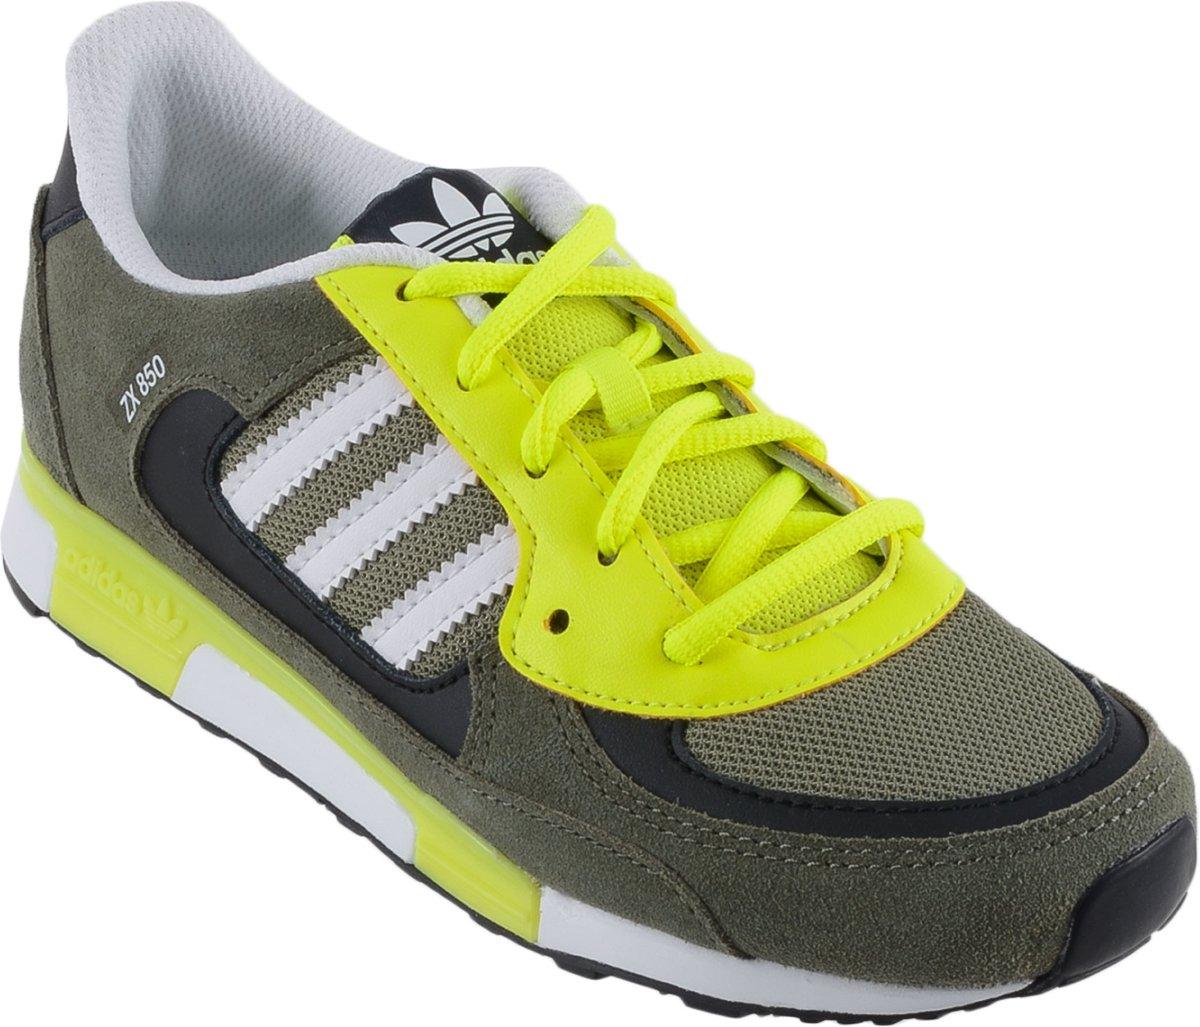 wholesale dealer f2523 15b1e bol.com   adidas ZX 850 Junior - Sneakers - Unisex - Maat 34 - Groen